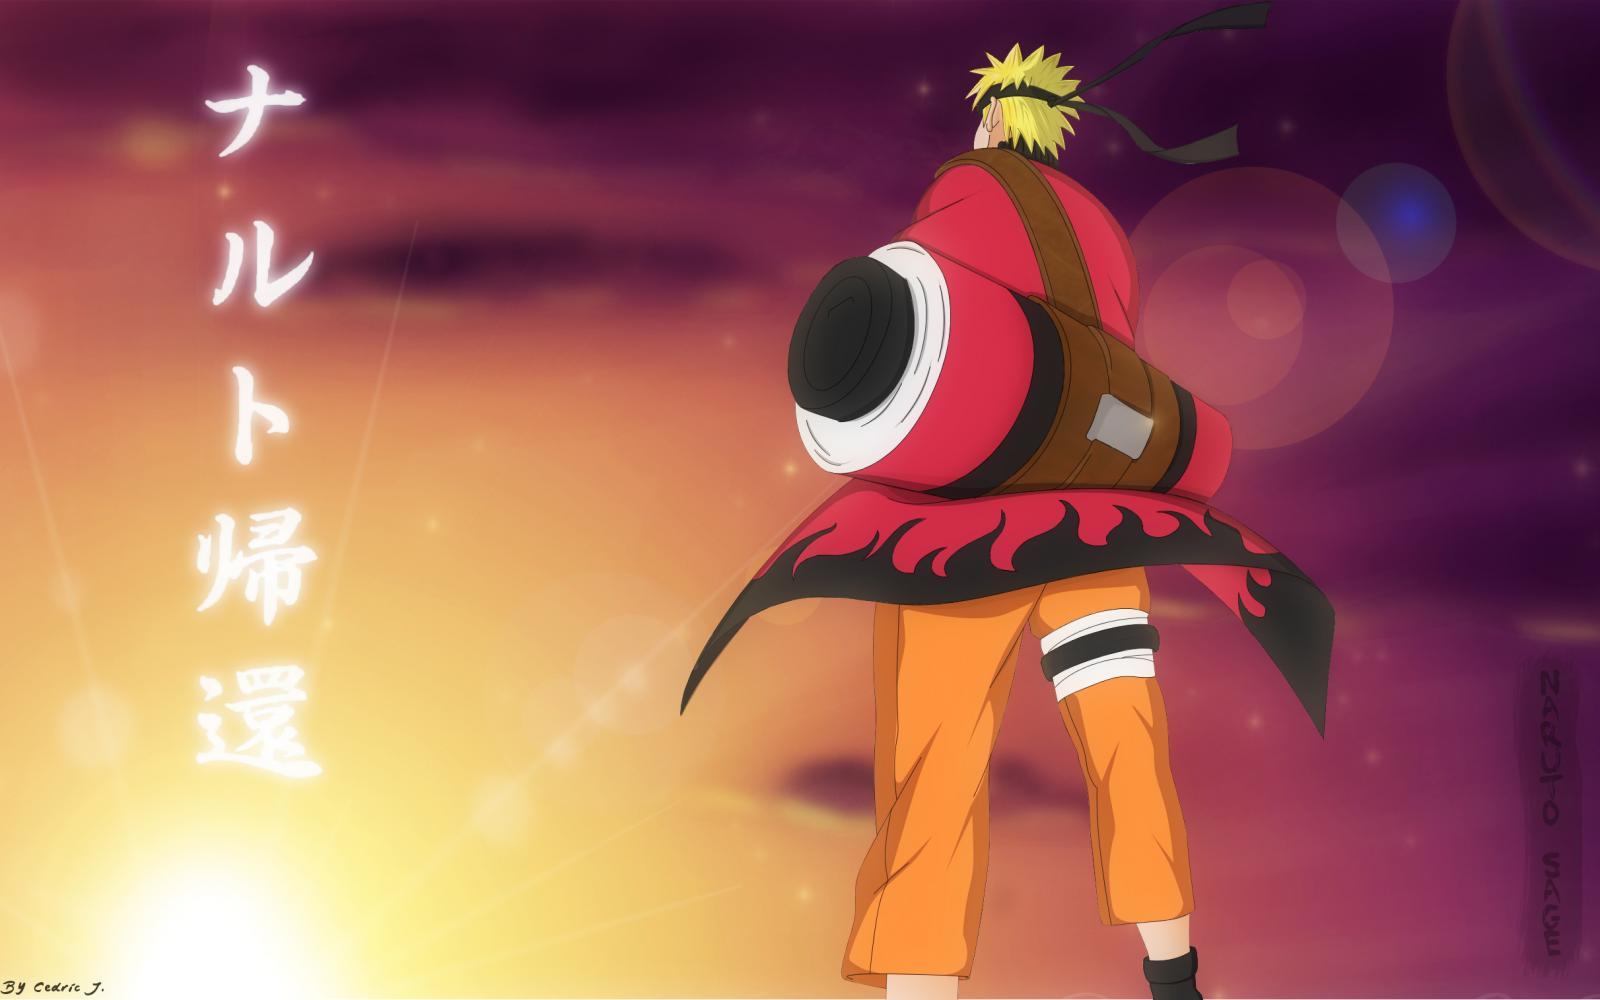 Unduh 6200 Koleksi Wallpaper Naruto Sennin HD Terbaik